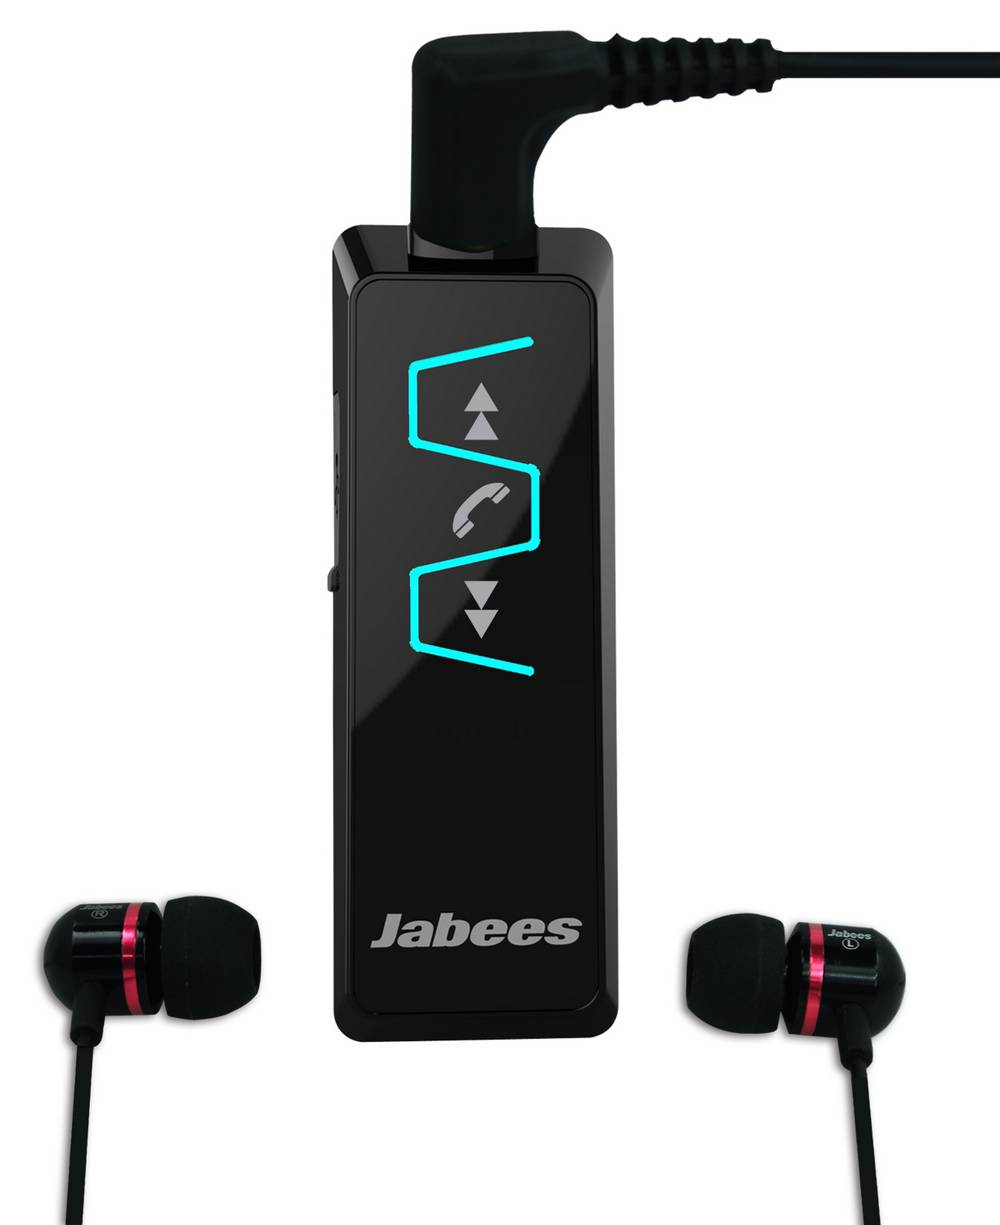 Bluetooth Hands Free Jabees Is901 Music Stereo Headset 5 In1 Motorola Xt 321 Defy Mini Black Slate 35mm